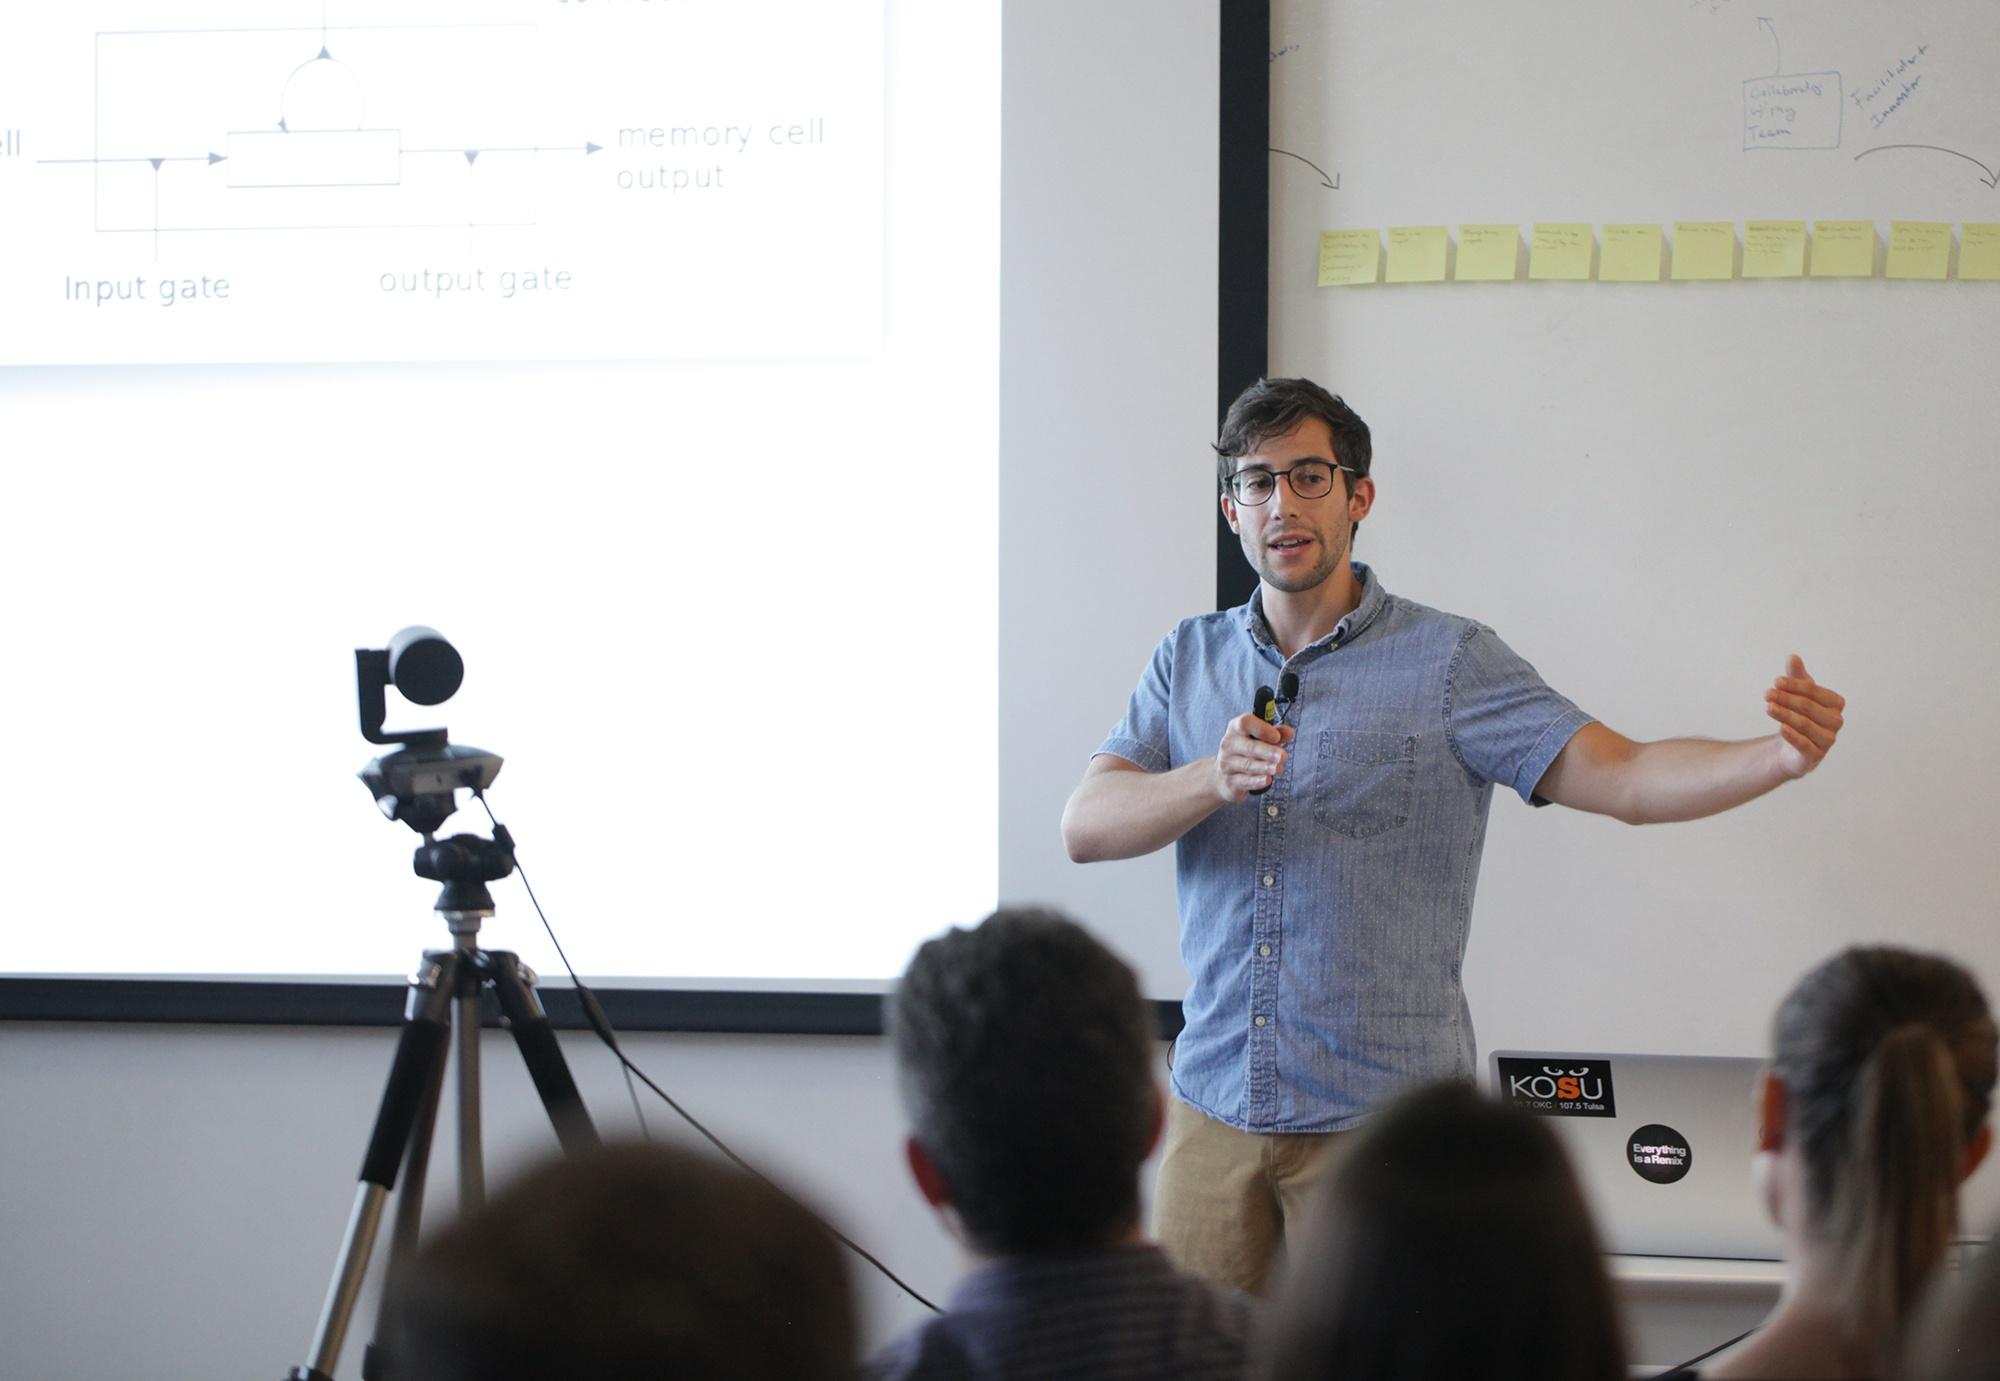 Data scientist Austin Schwinn talks about machine learning for predicting dengue fever outbreaks.